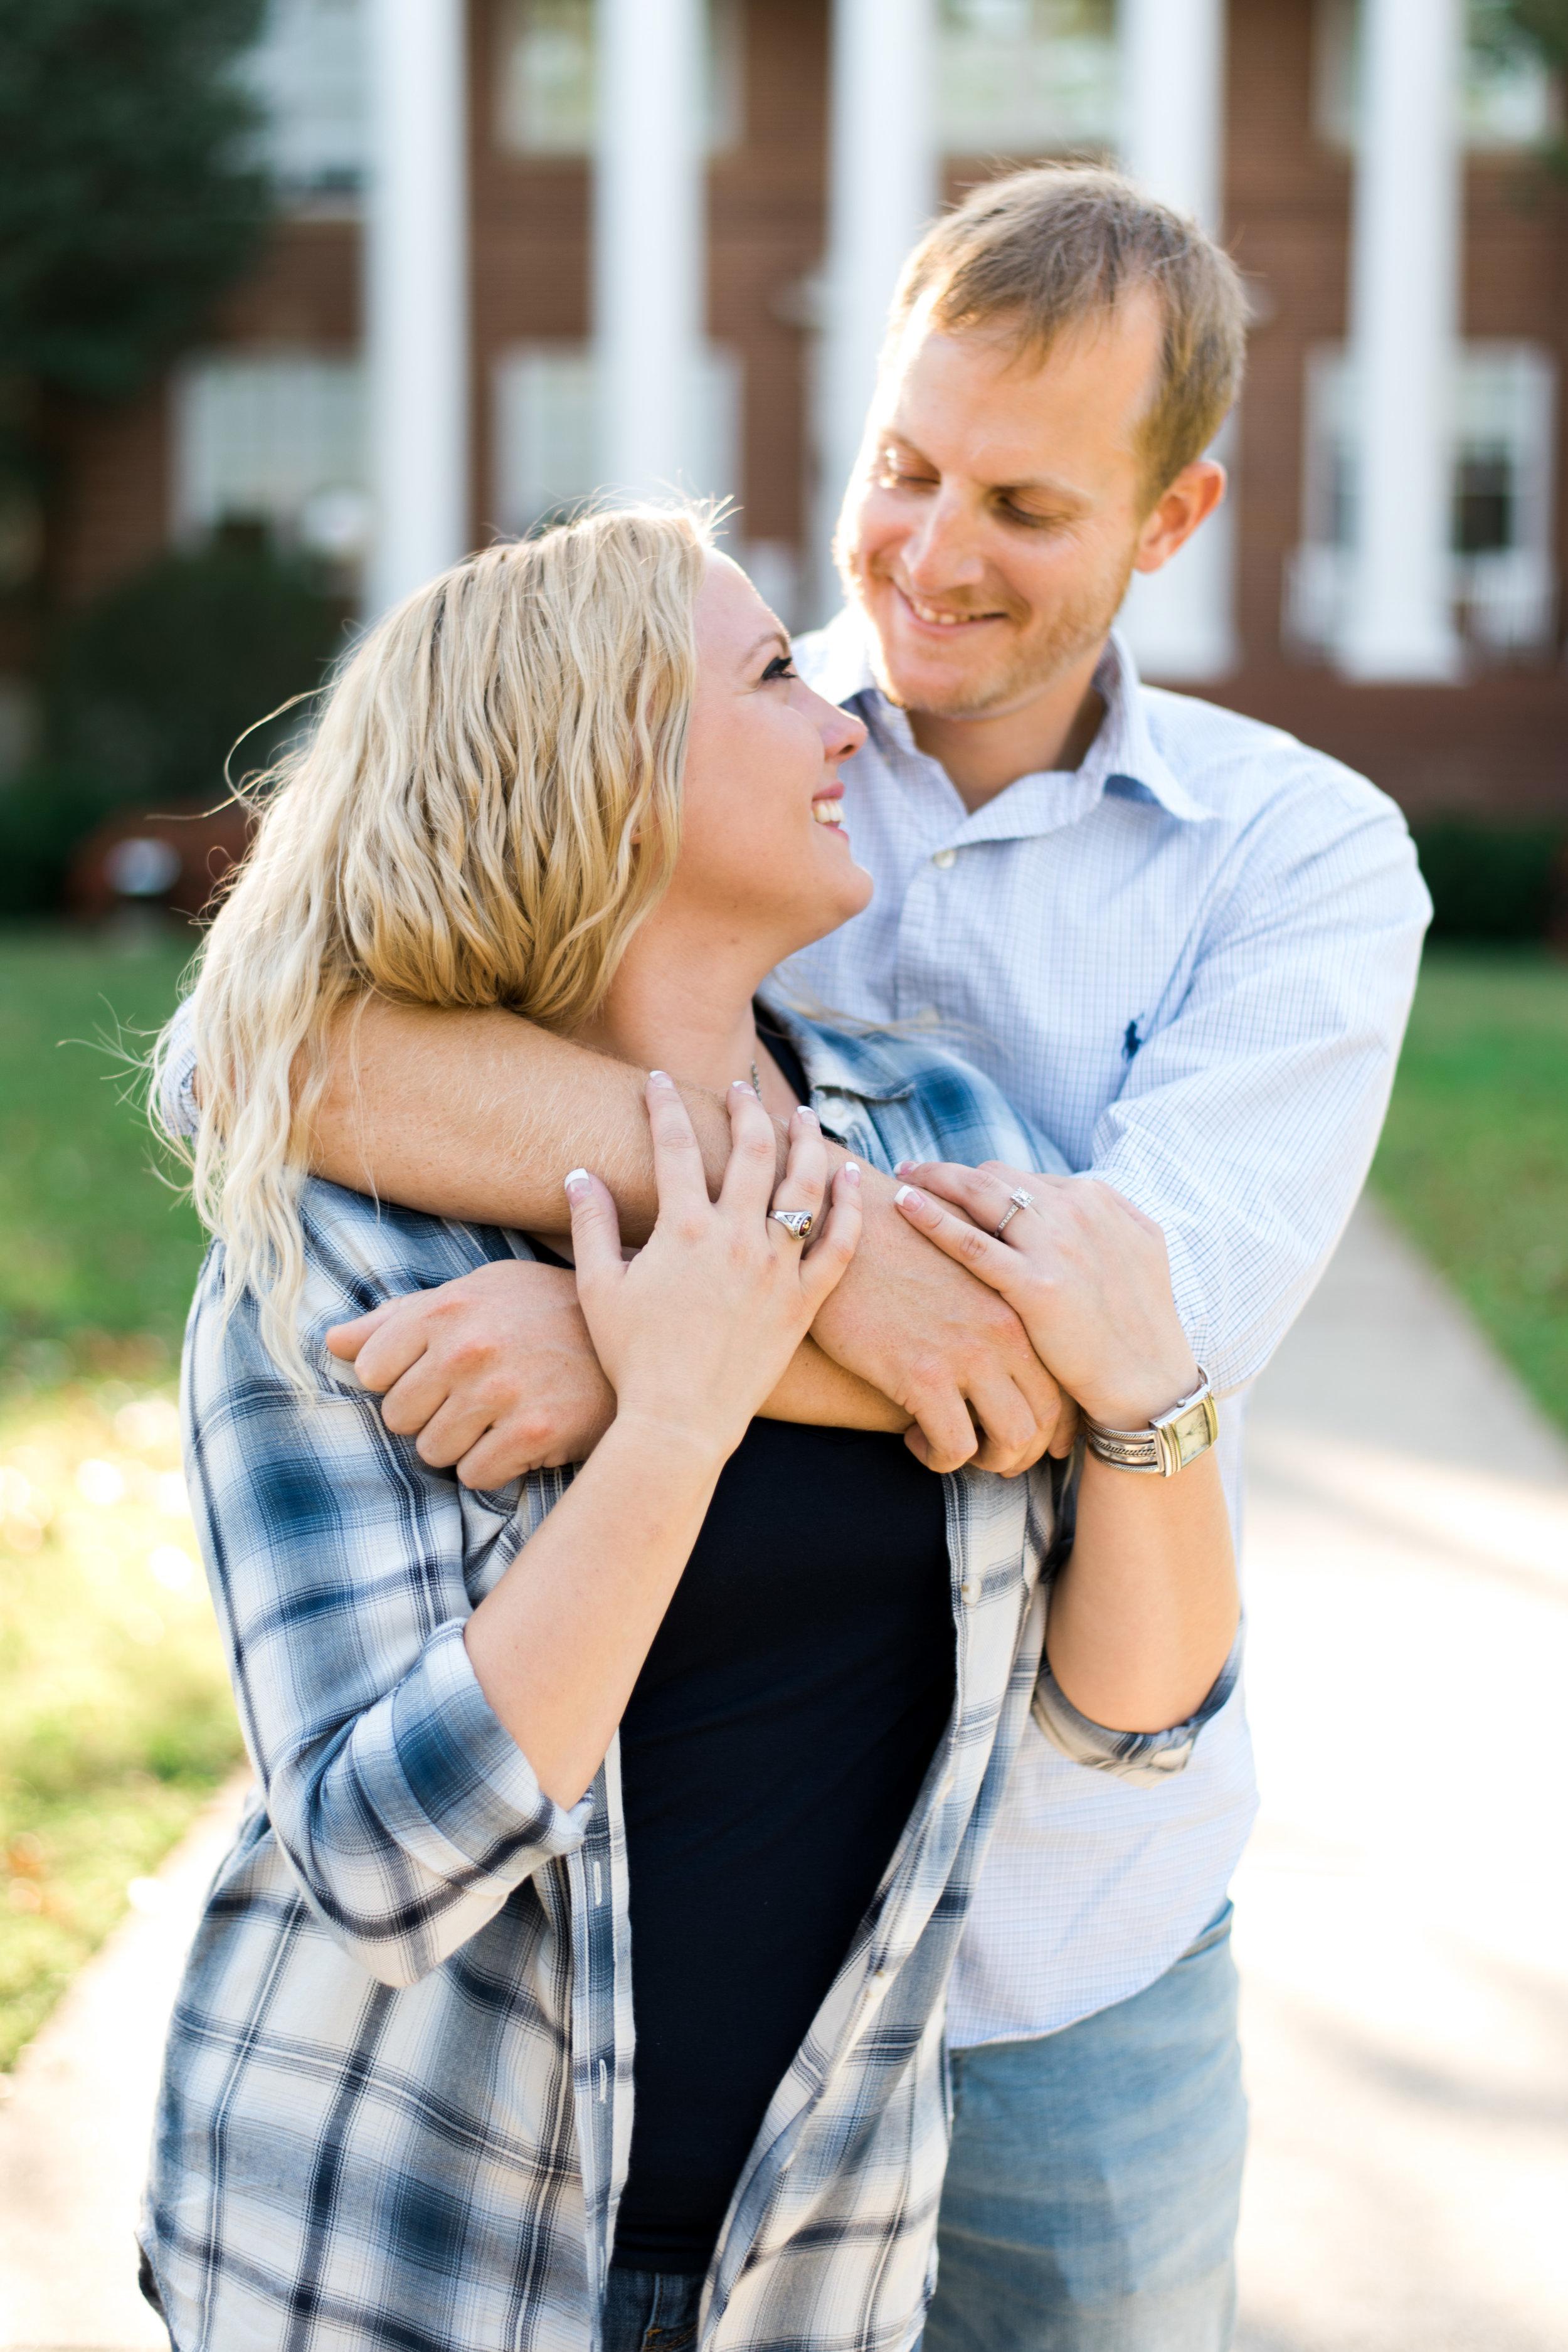 Lynchburg_College_Sorella_Farms_Baseball_Ballet_Virginia_Engagement_Session_Wedding_Photographers (48).jpg